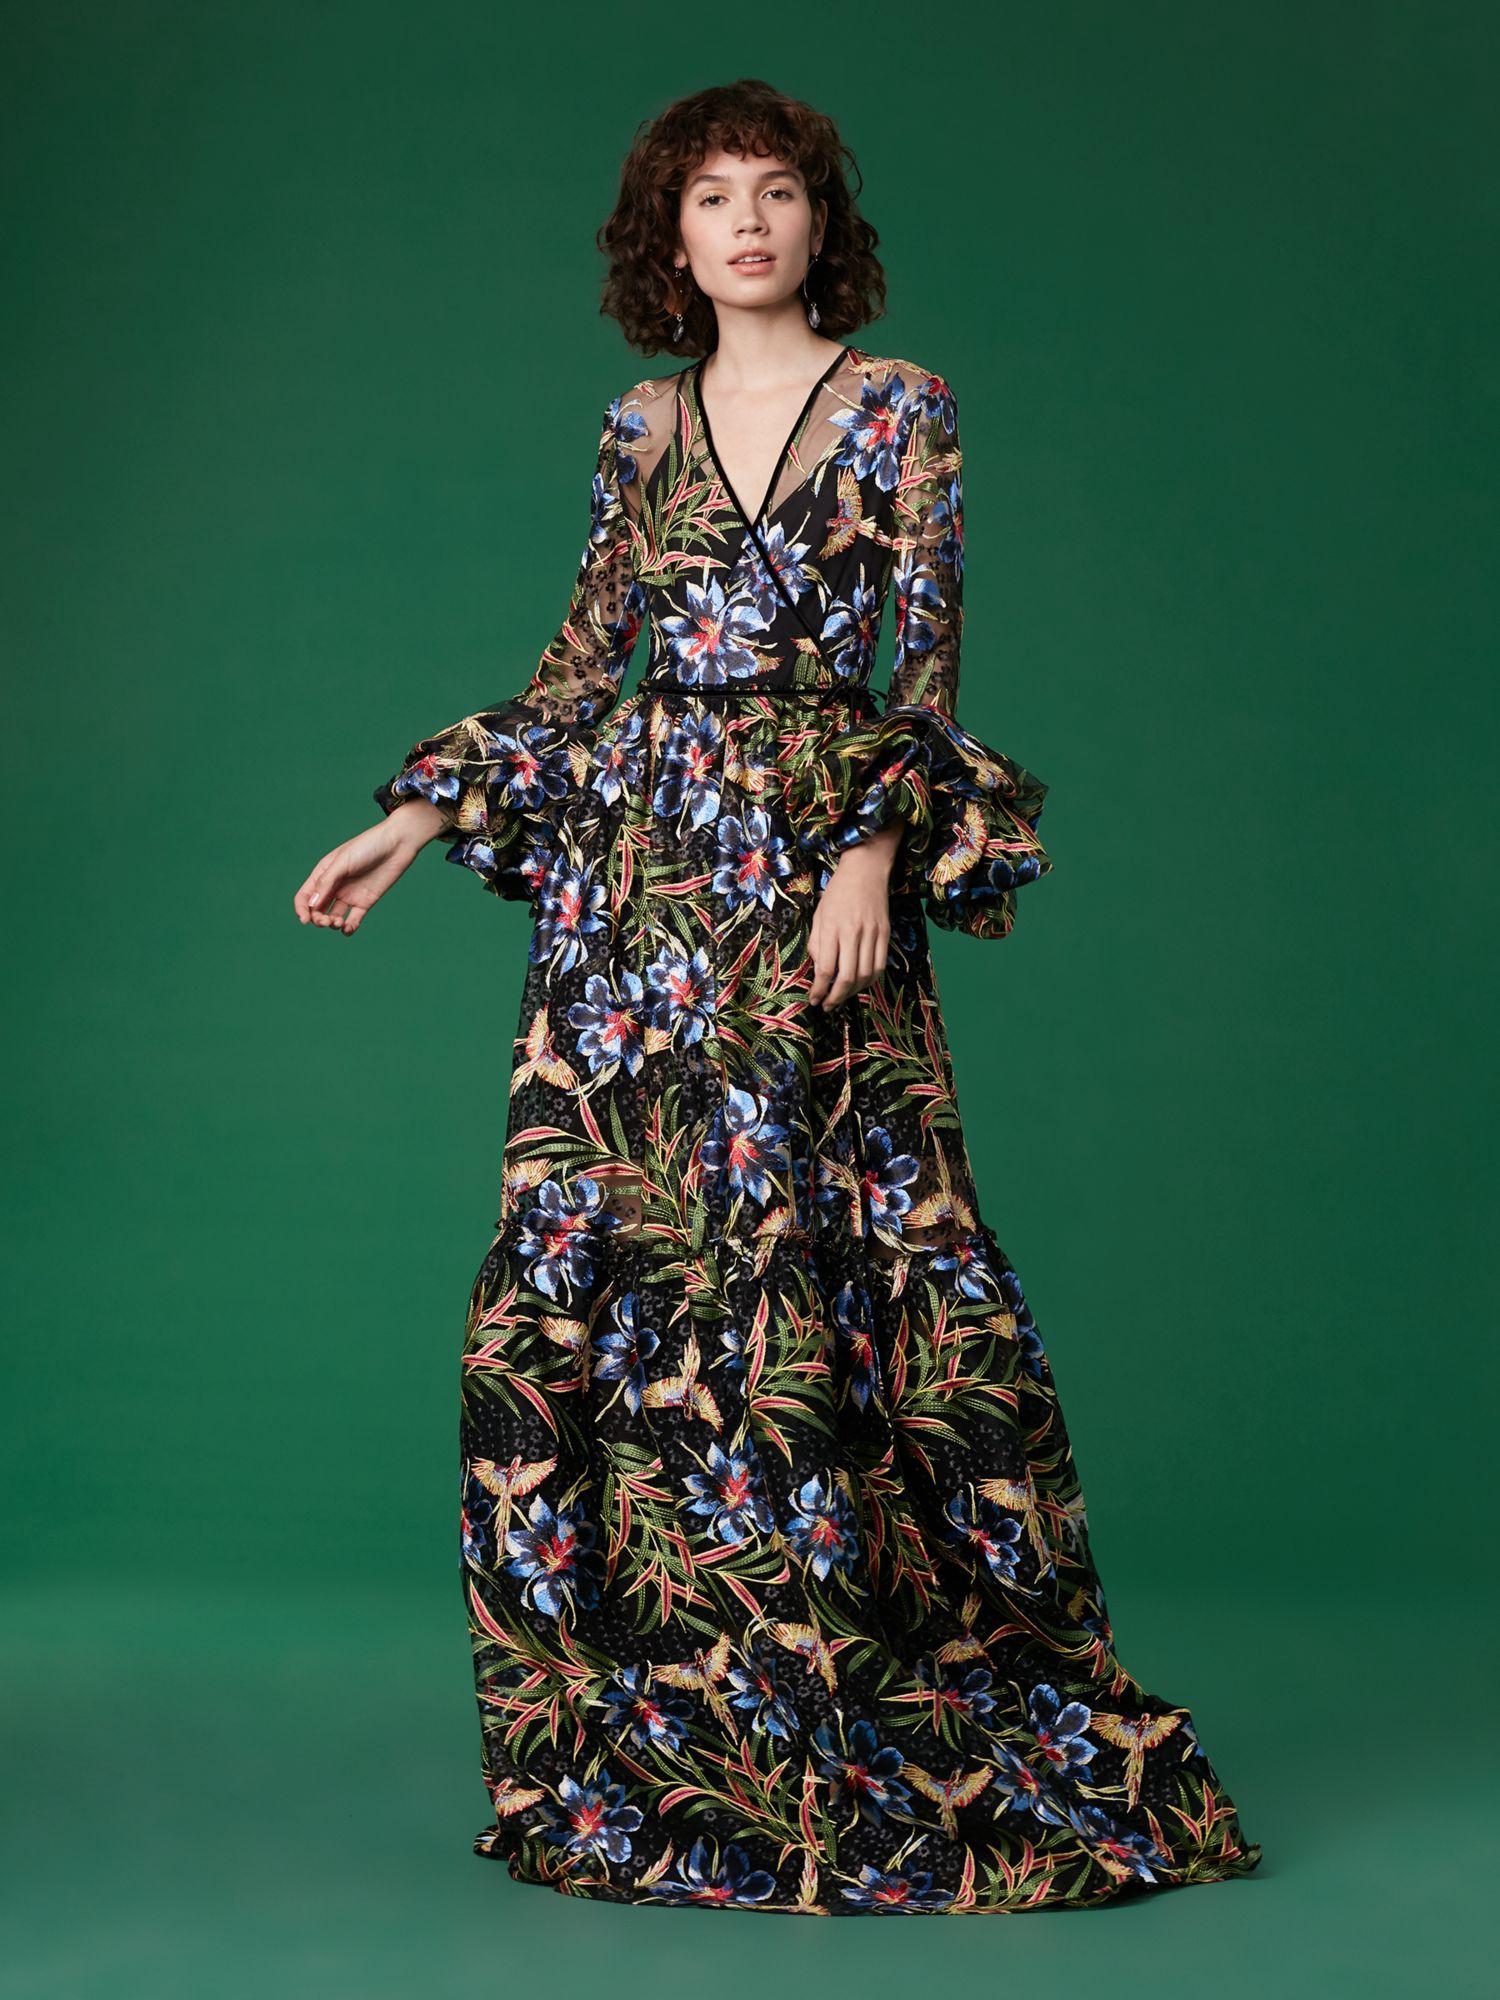 0ca35a3475d Diane Von Furstenberg Dvf Puff Sleeve Maxi Wrap Dress - Quincy Pearson  Multi 0